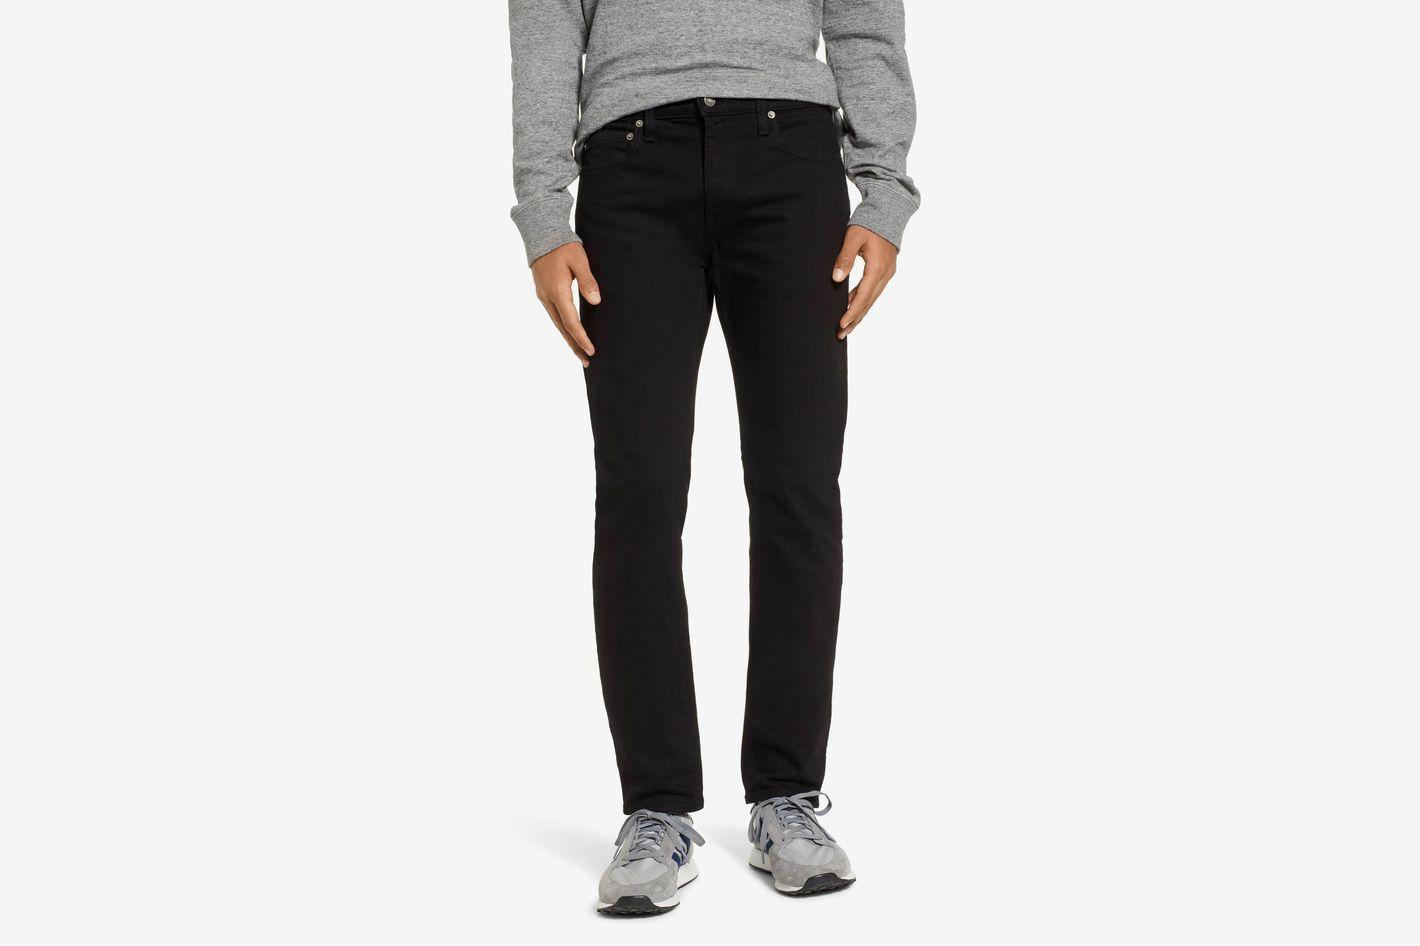 J.Crew 484 Slim Fit Stretch Denim Jeans